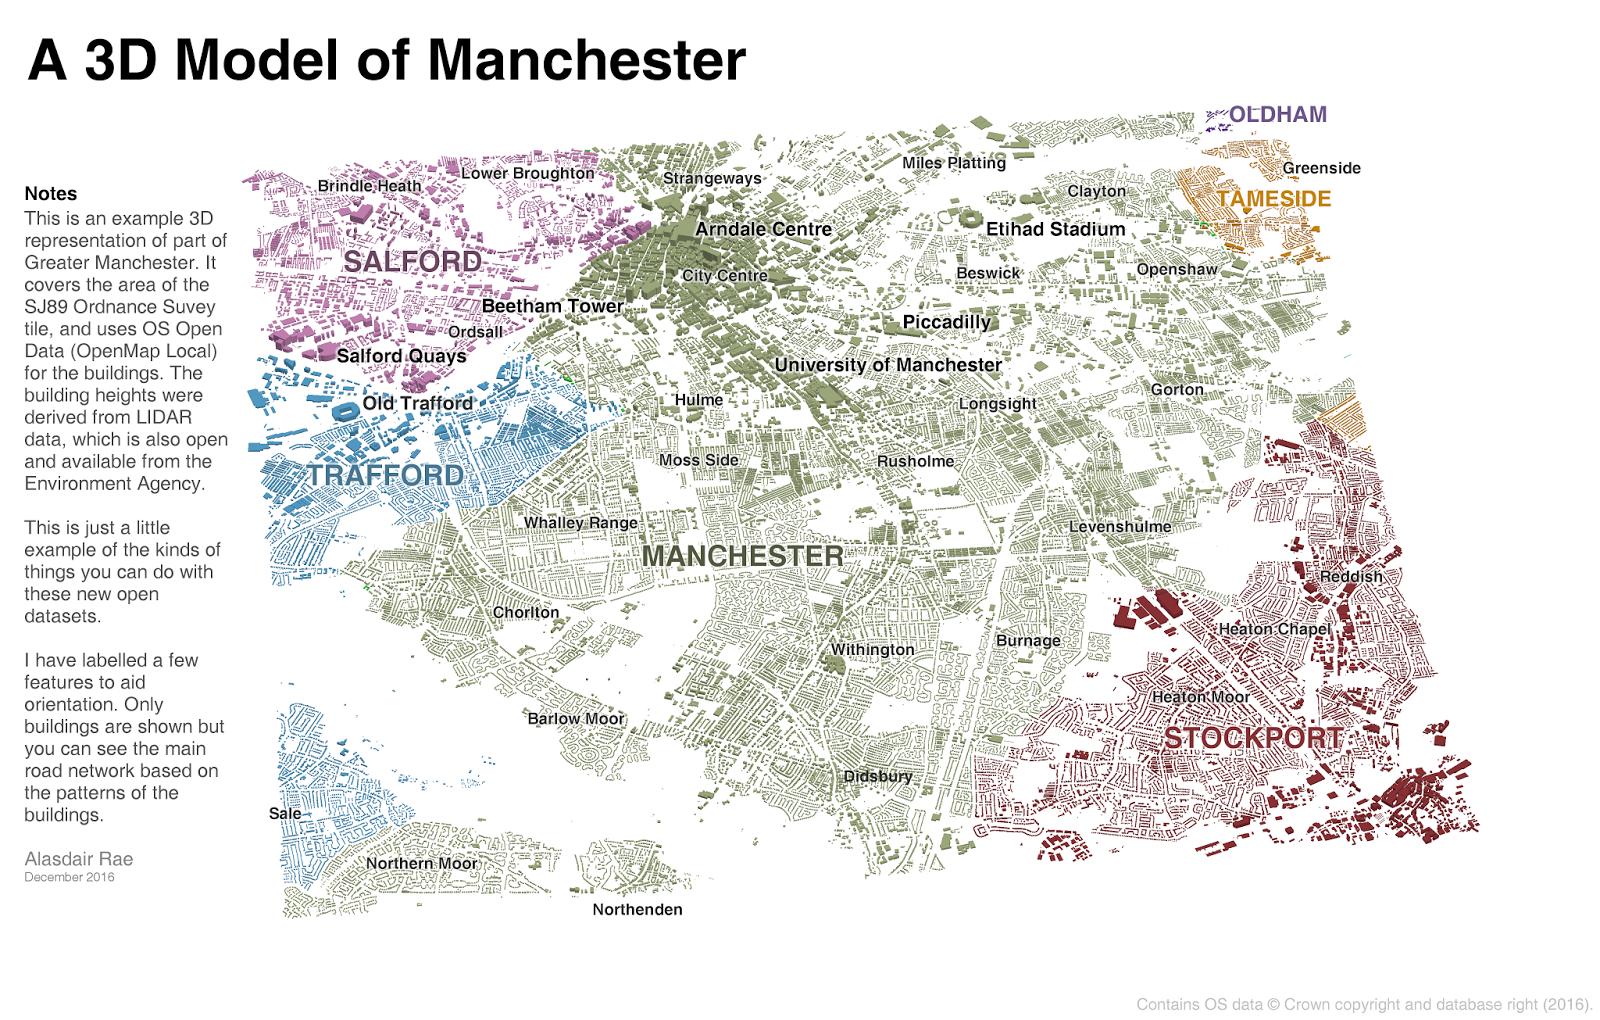 Stats, Maps n Pix: Creating a 3D city model using open data